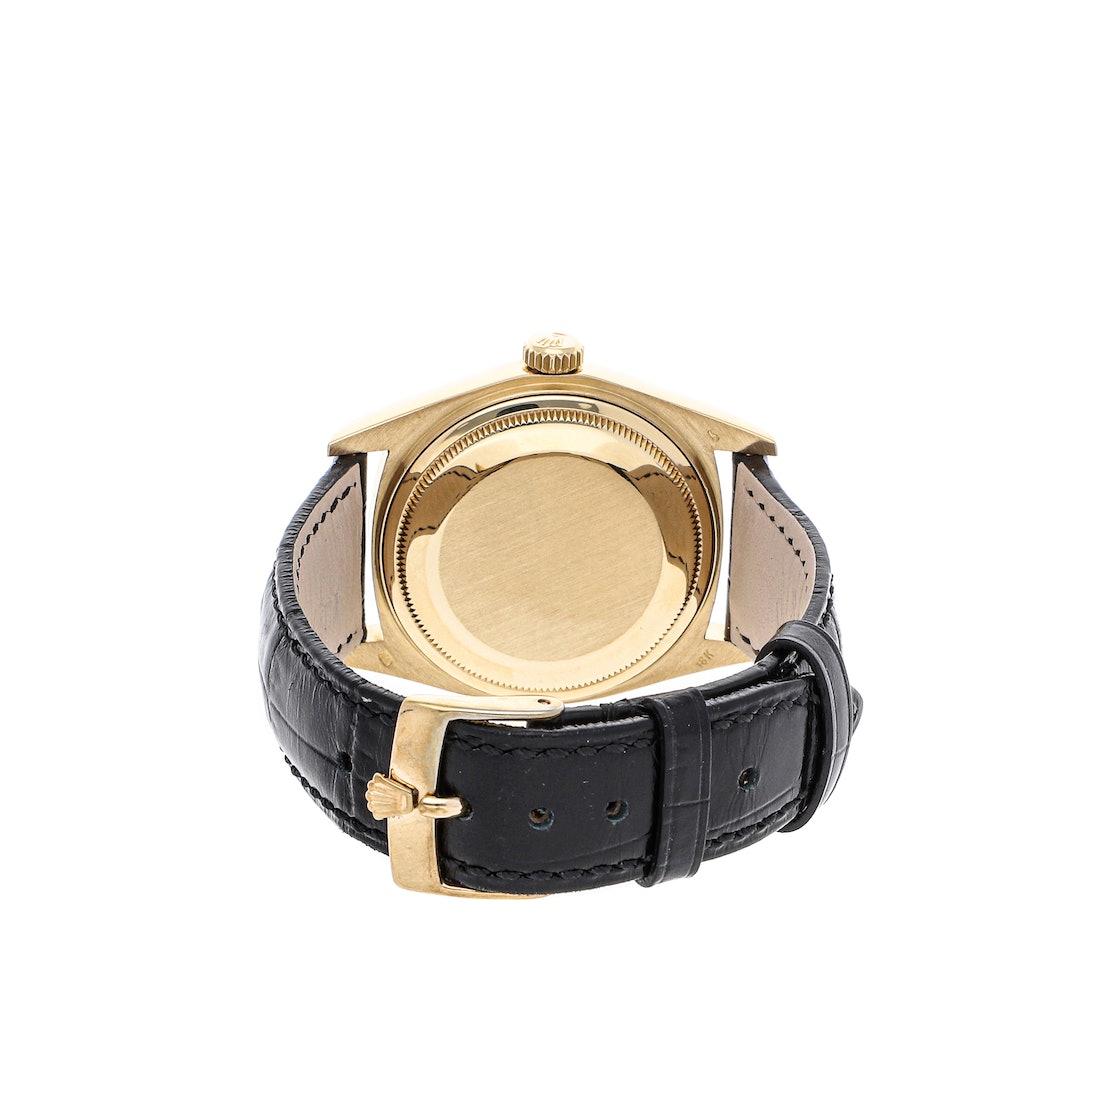 Rolex Datejust 16018